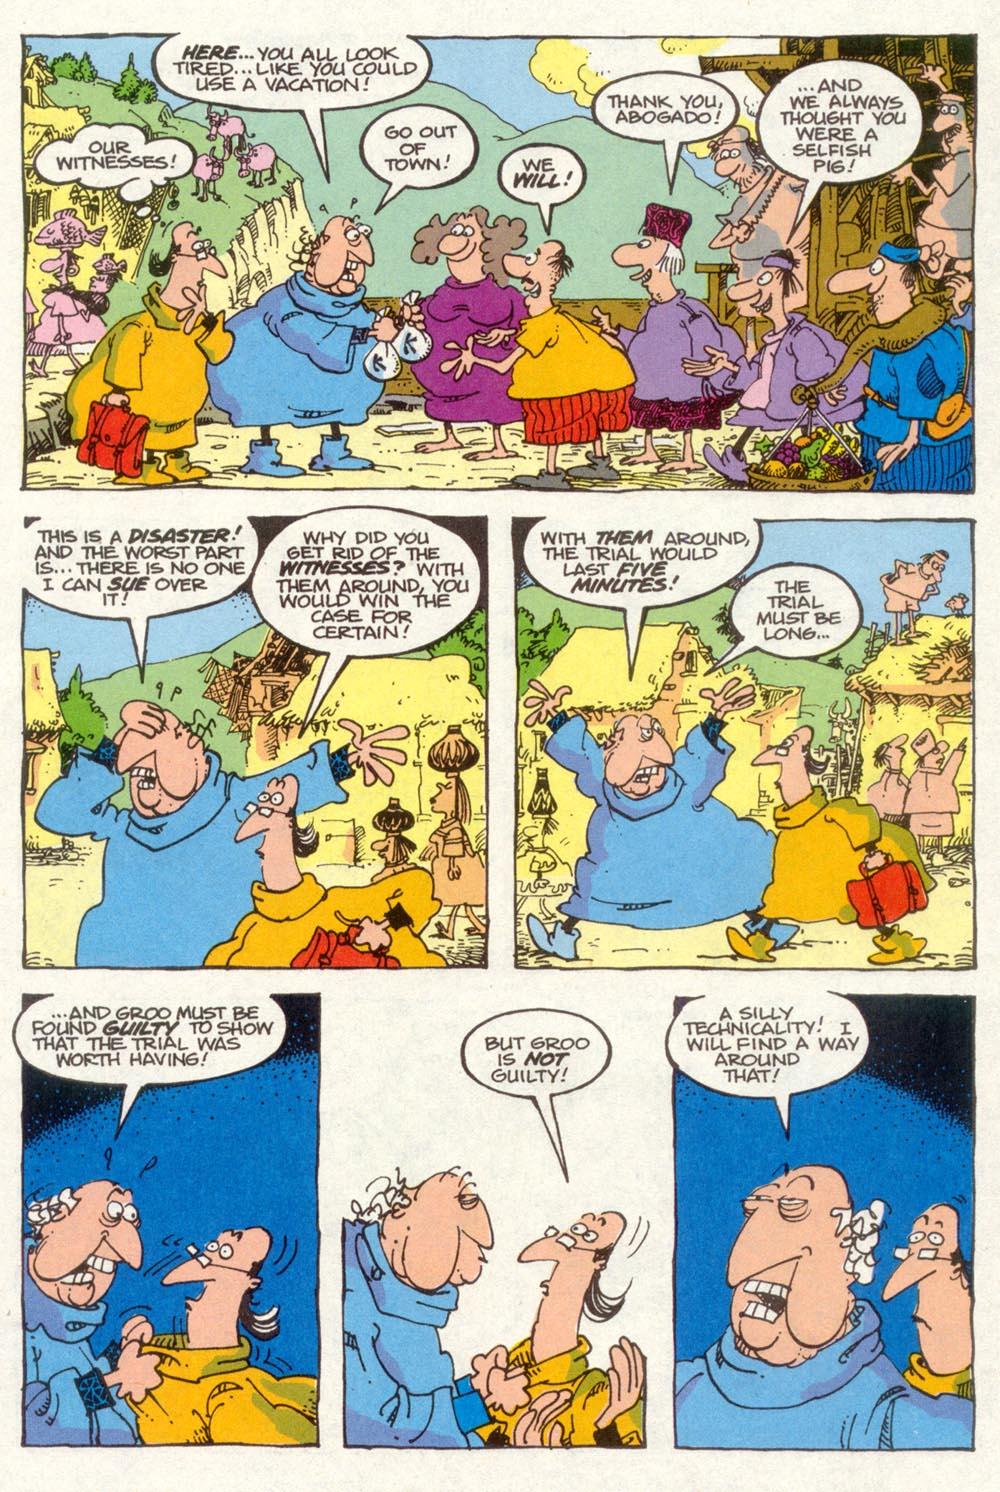 Read online Sergio Aragonés Groo the Wanderer comic -  Issue #90 - 17